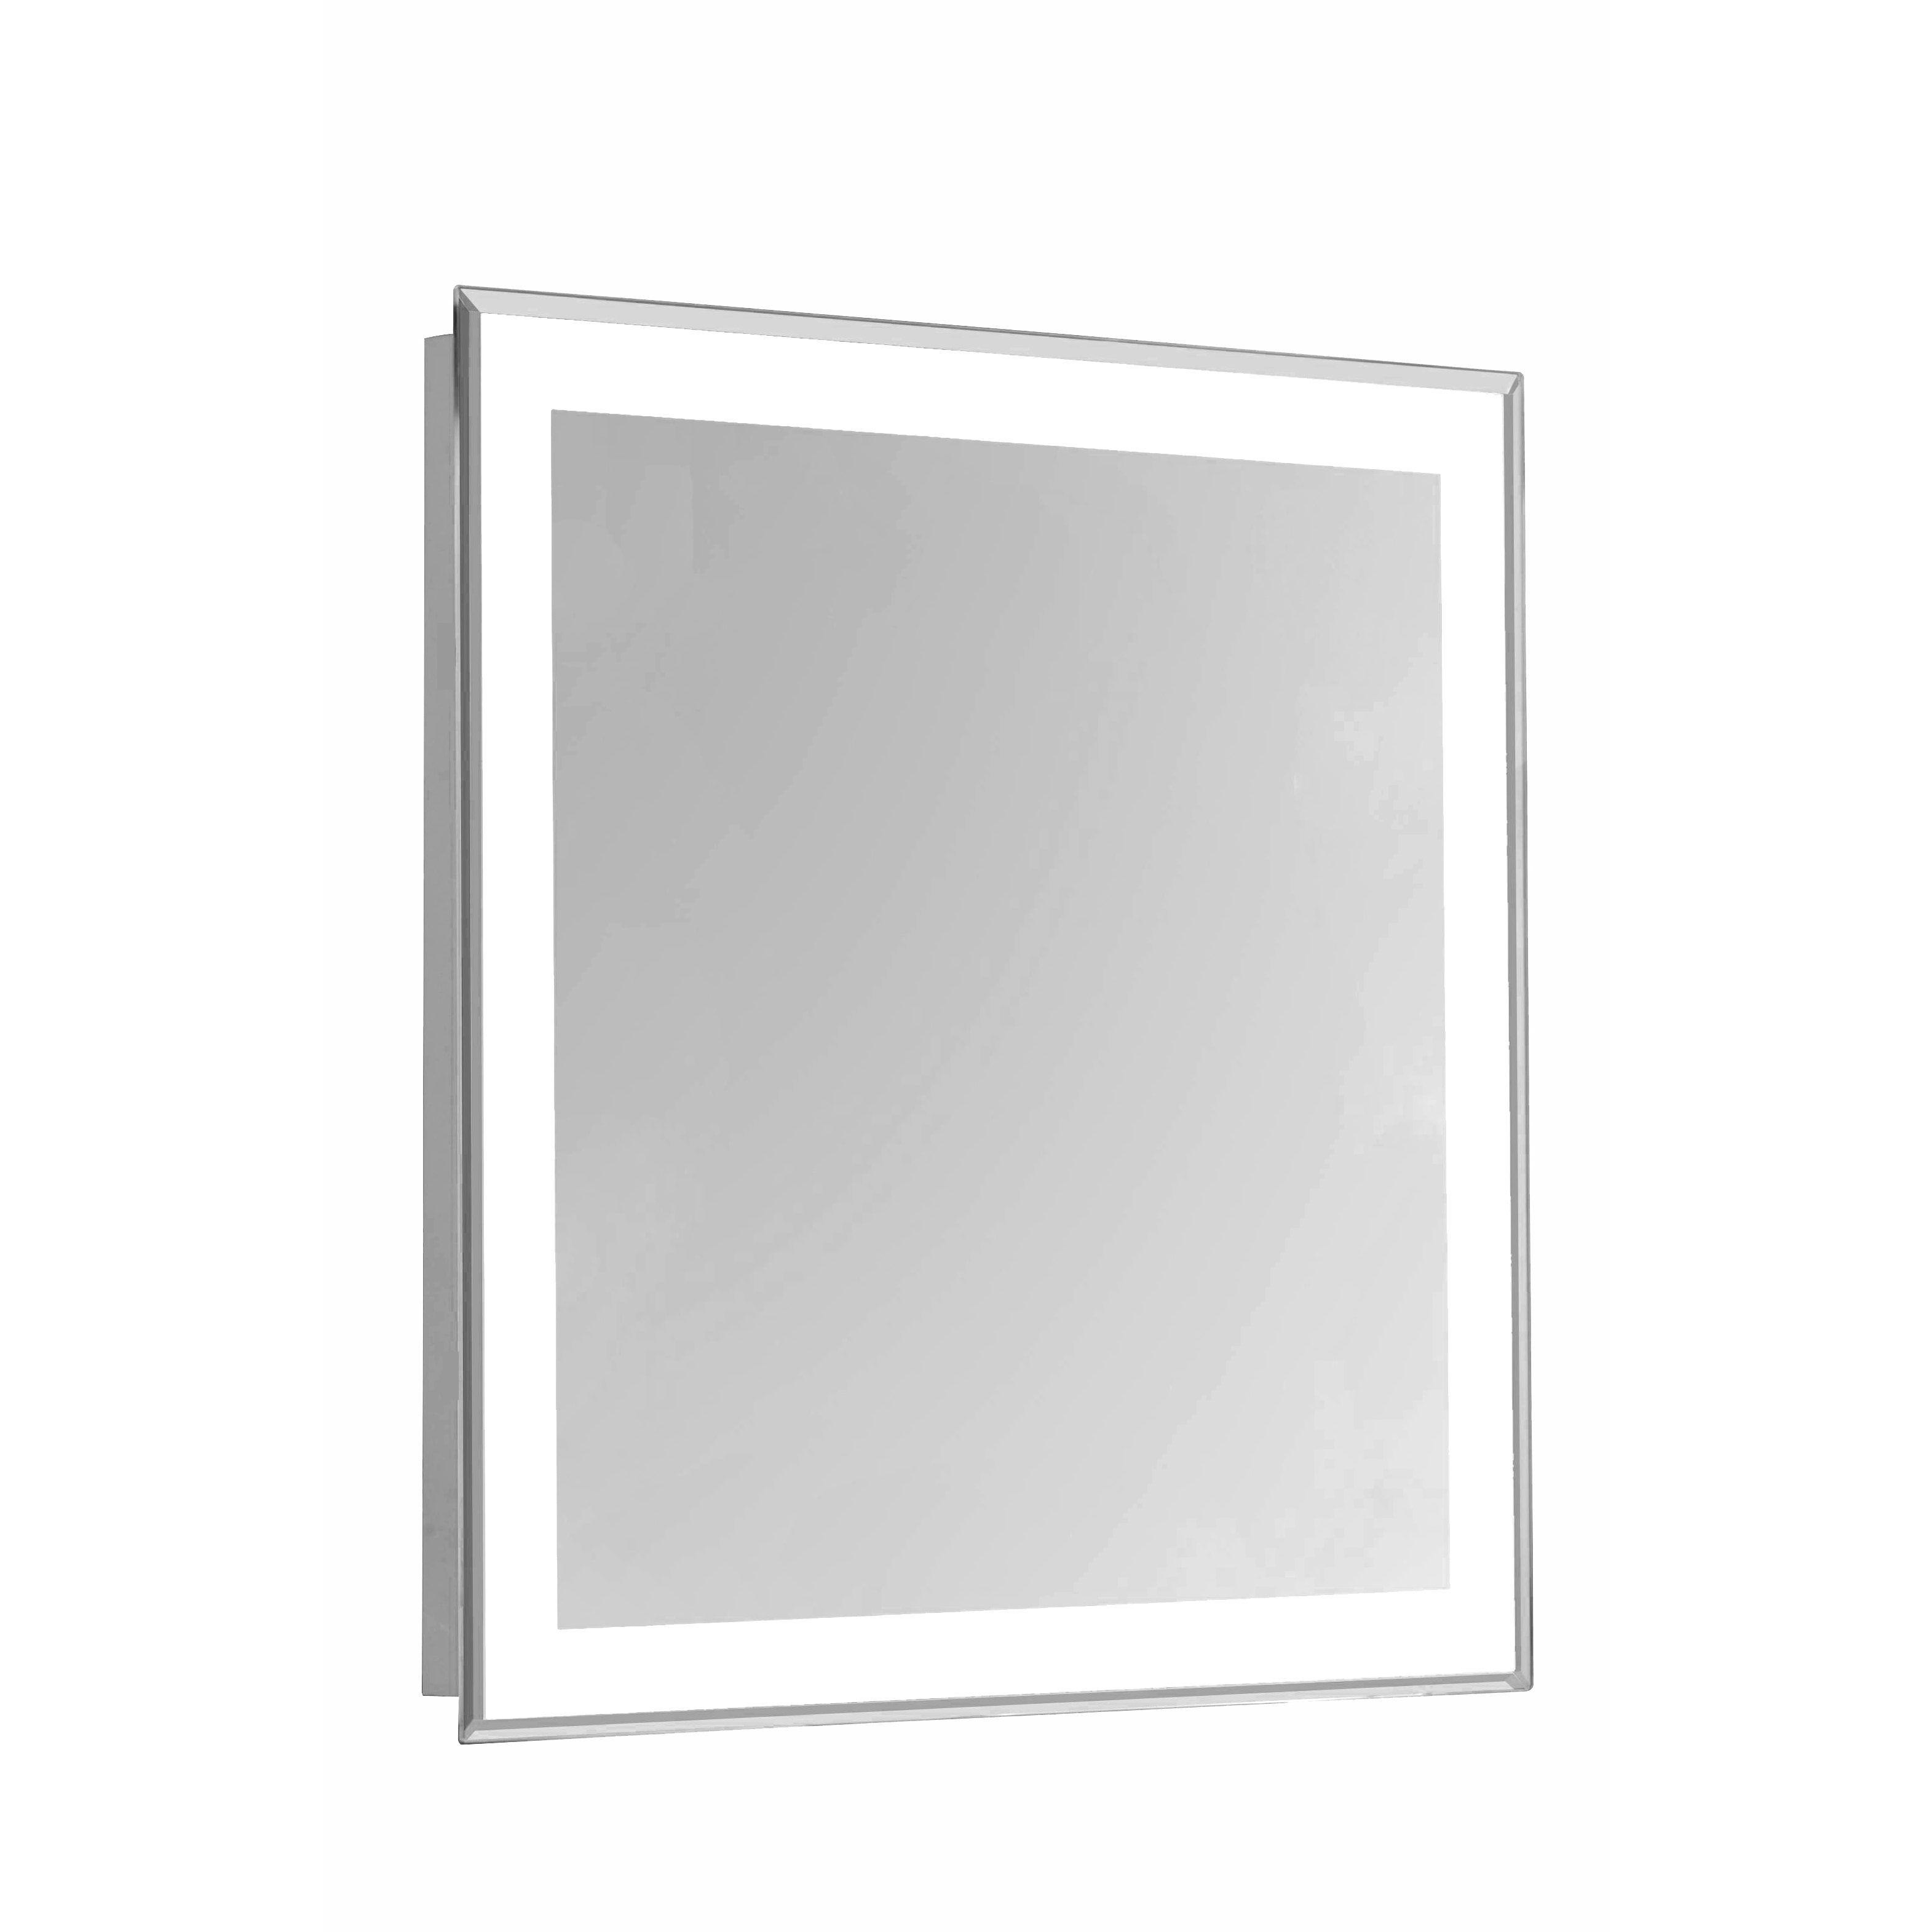 Elegant Lighting Nova 4 Sided Led Edge Electric Mirror 24 X 30